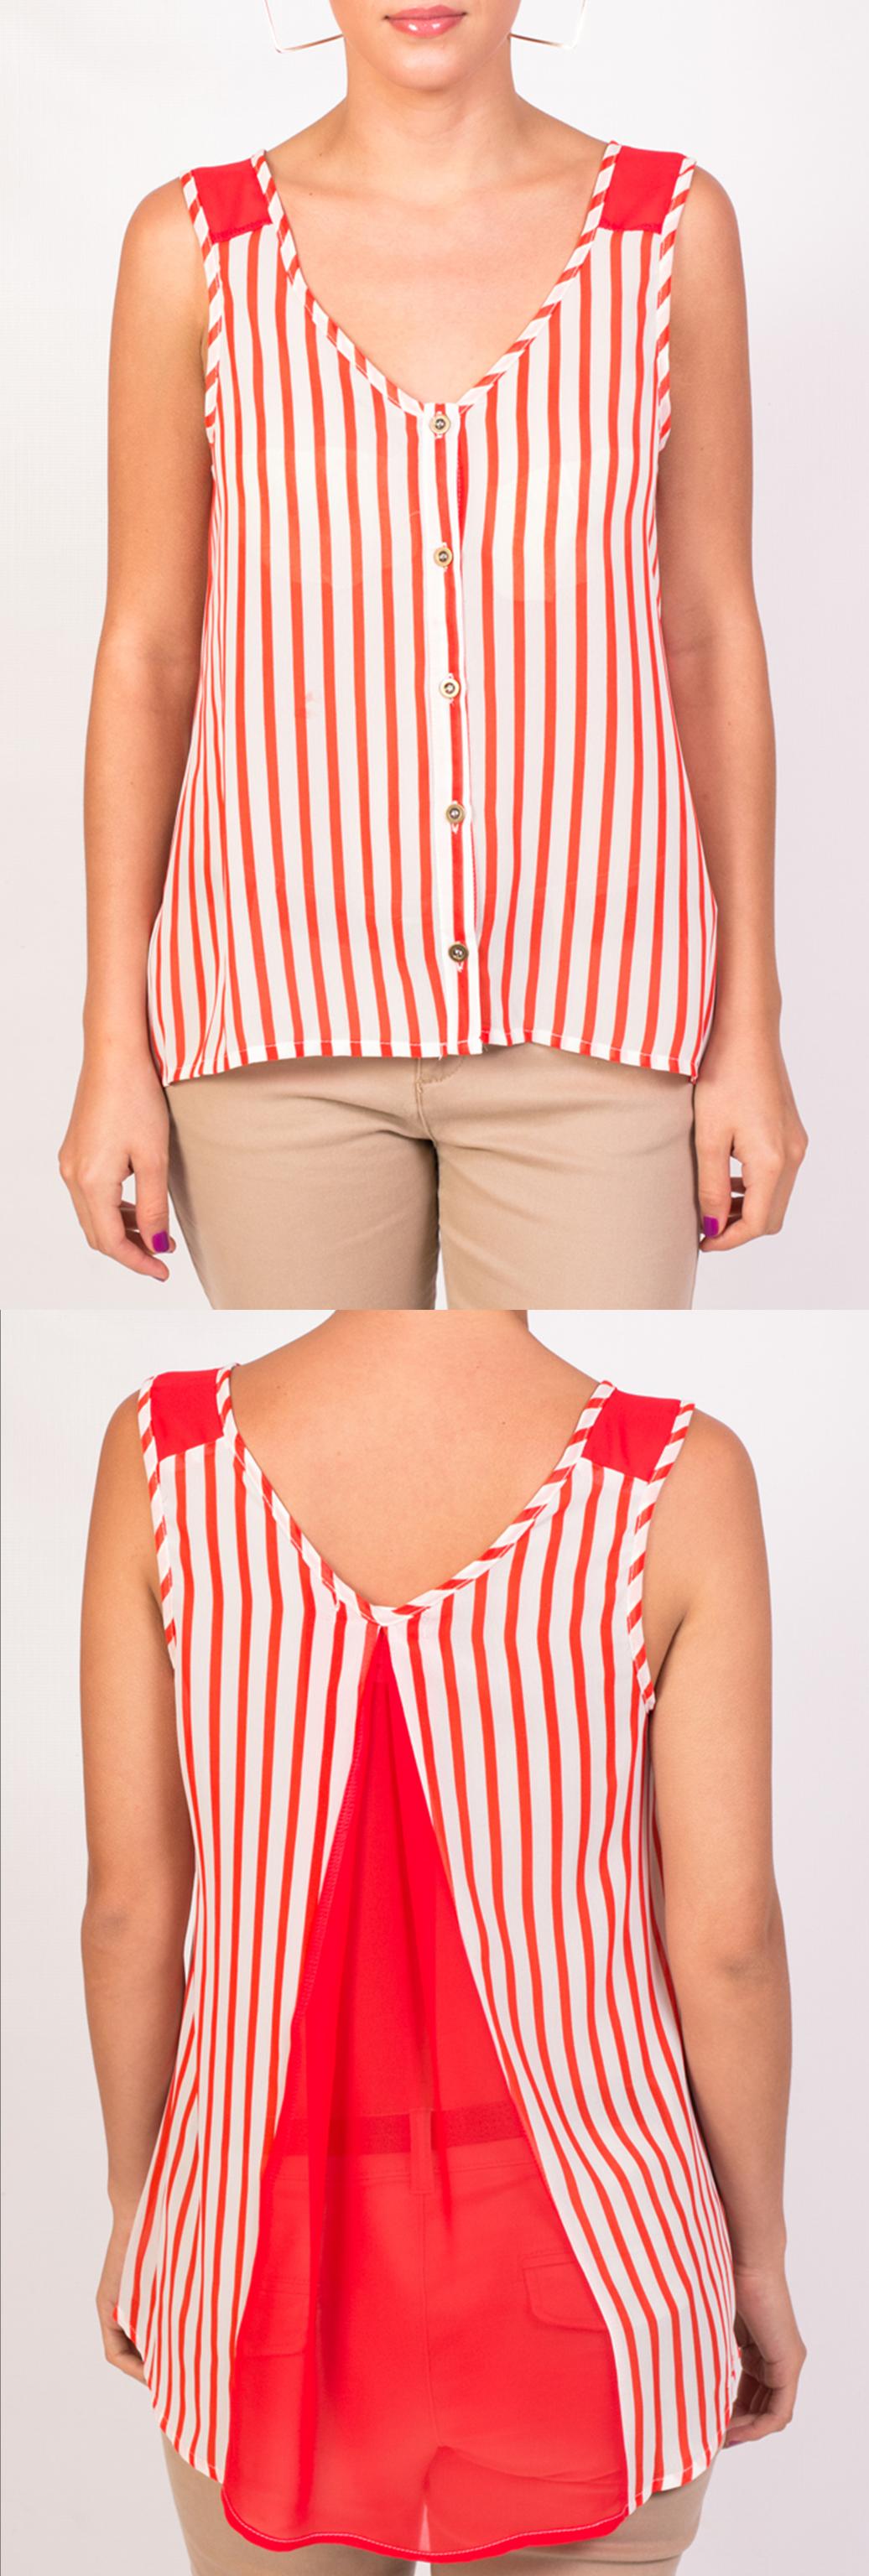 ⊛ Aprende a Combinar tu Vestido Rojo【100% Glamour】